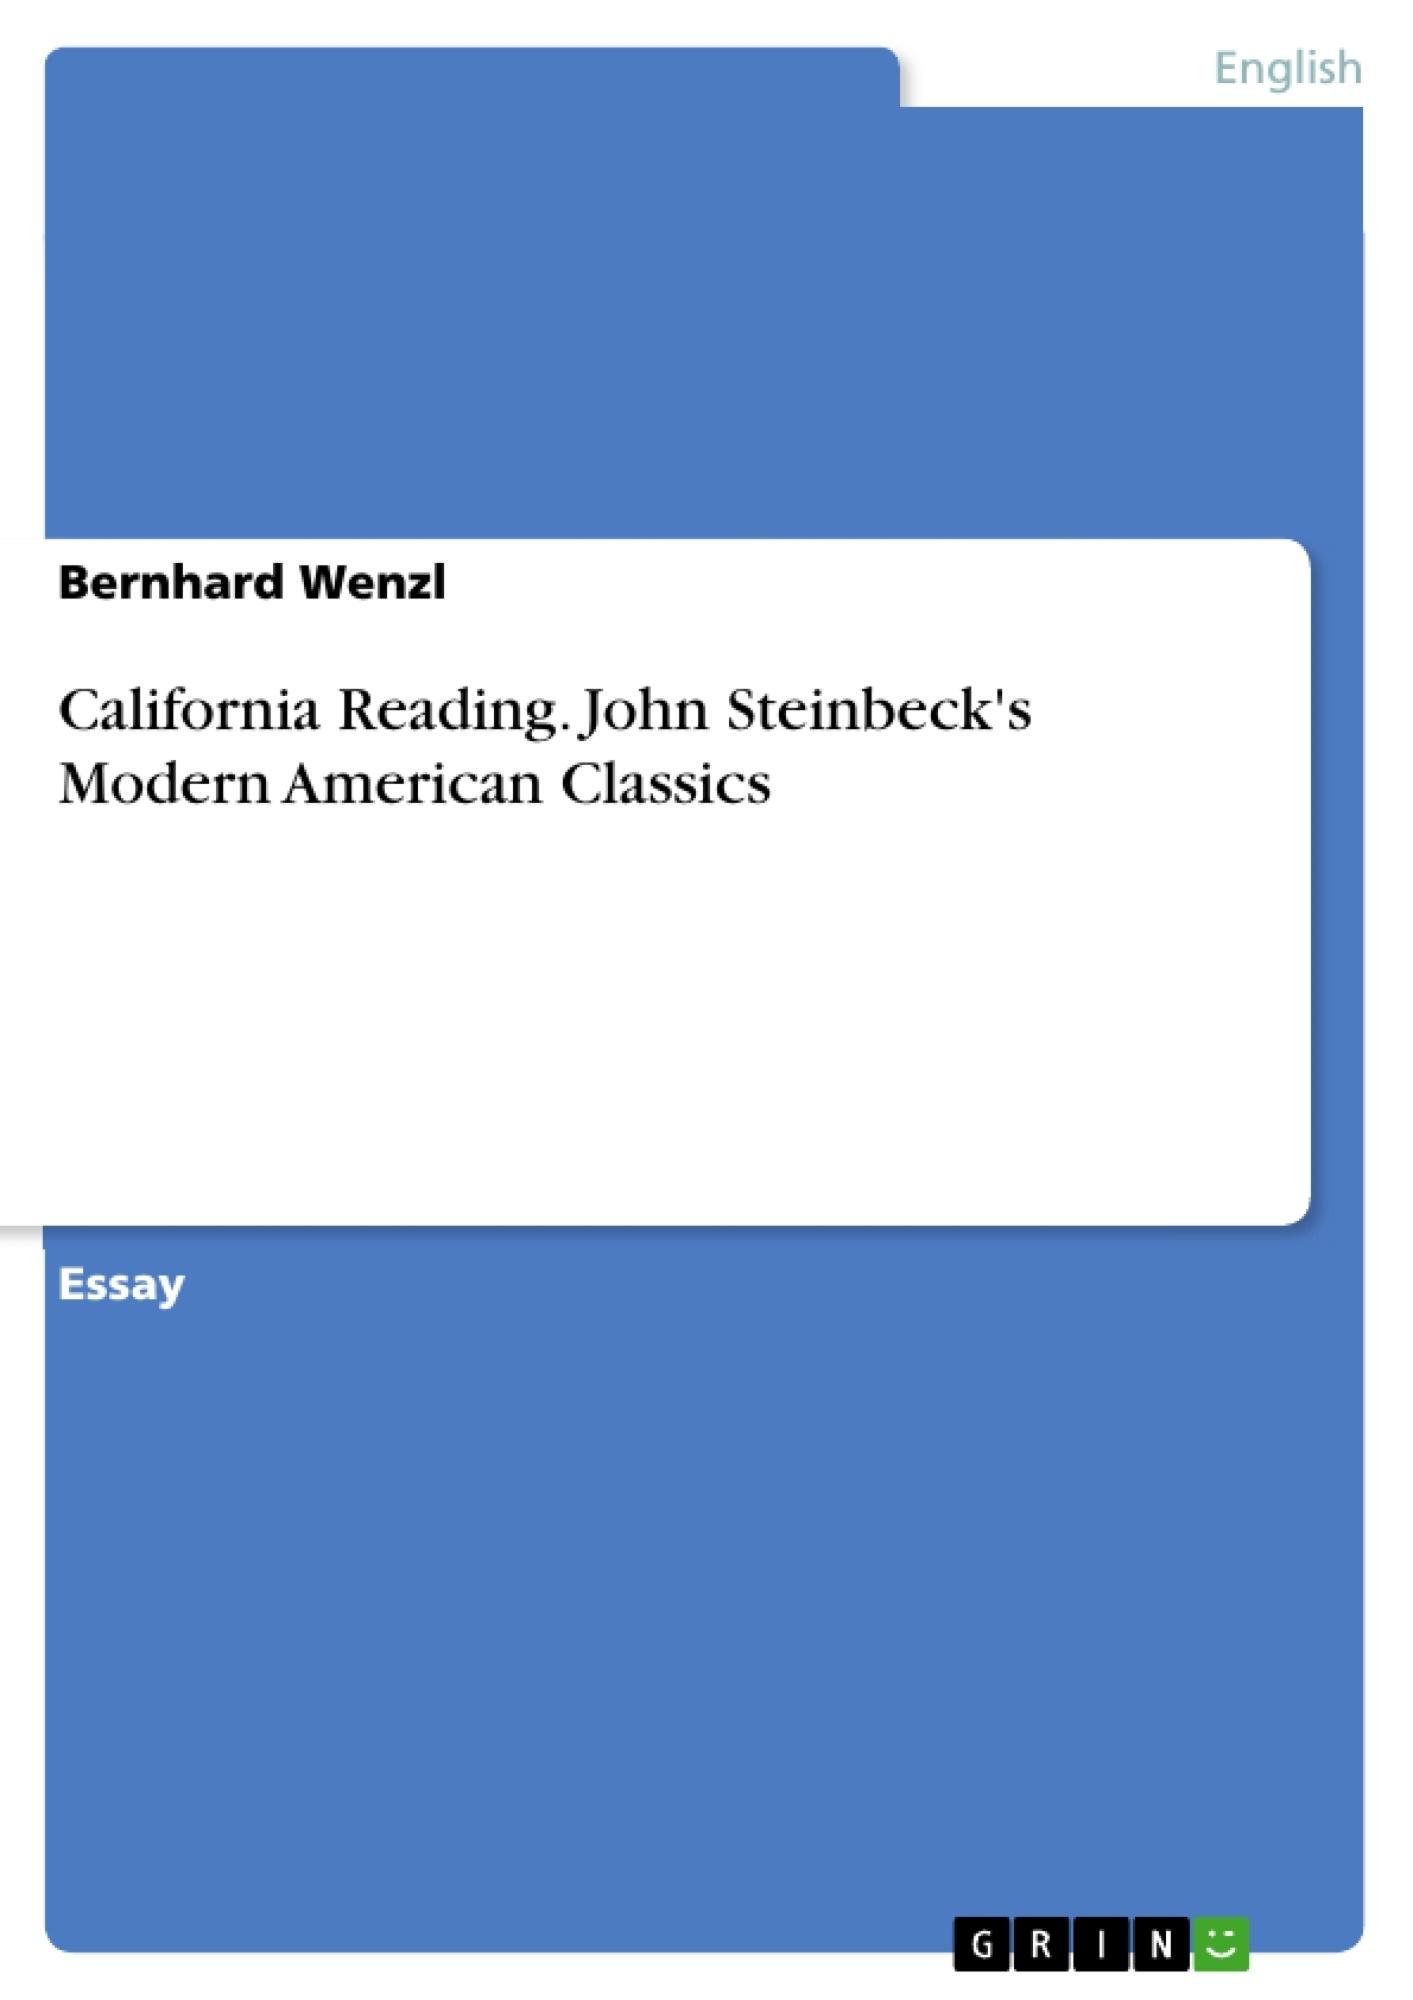 Title: California Reading. John Steinbeck's Modern American Classics